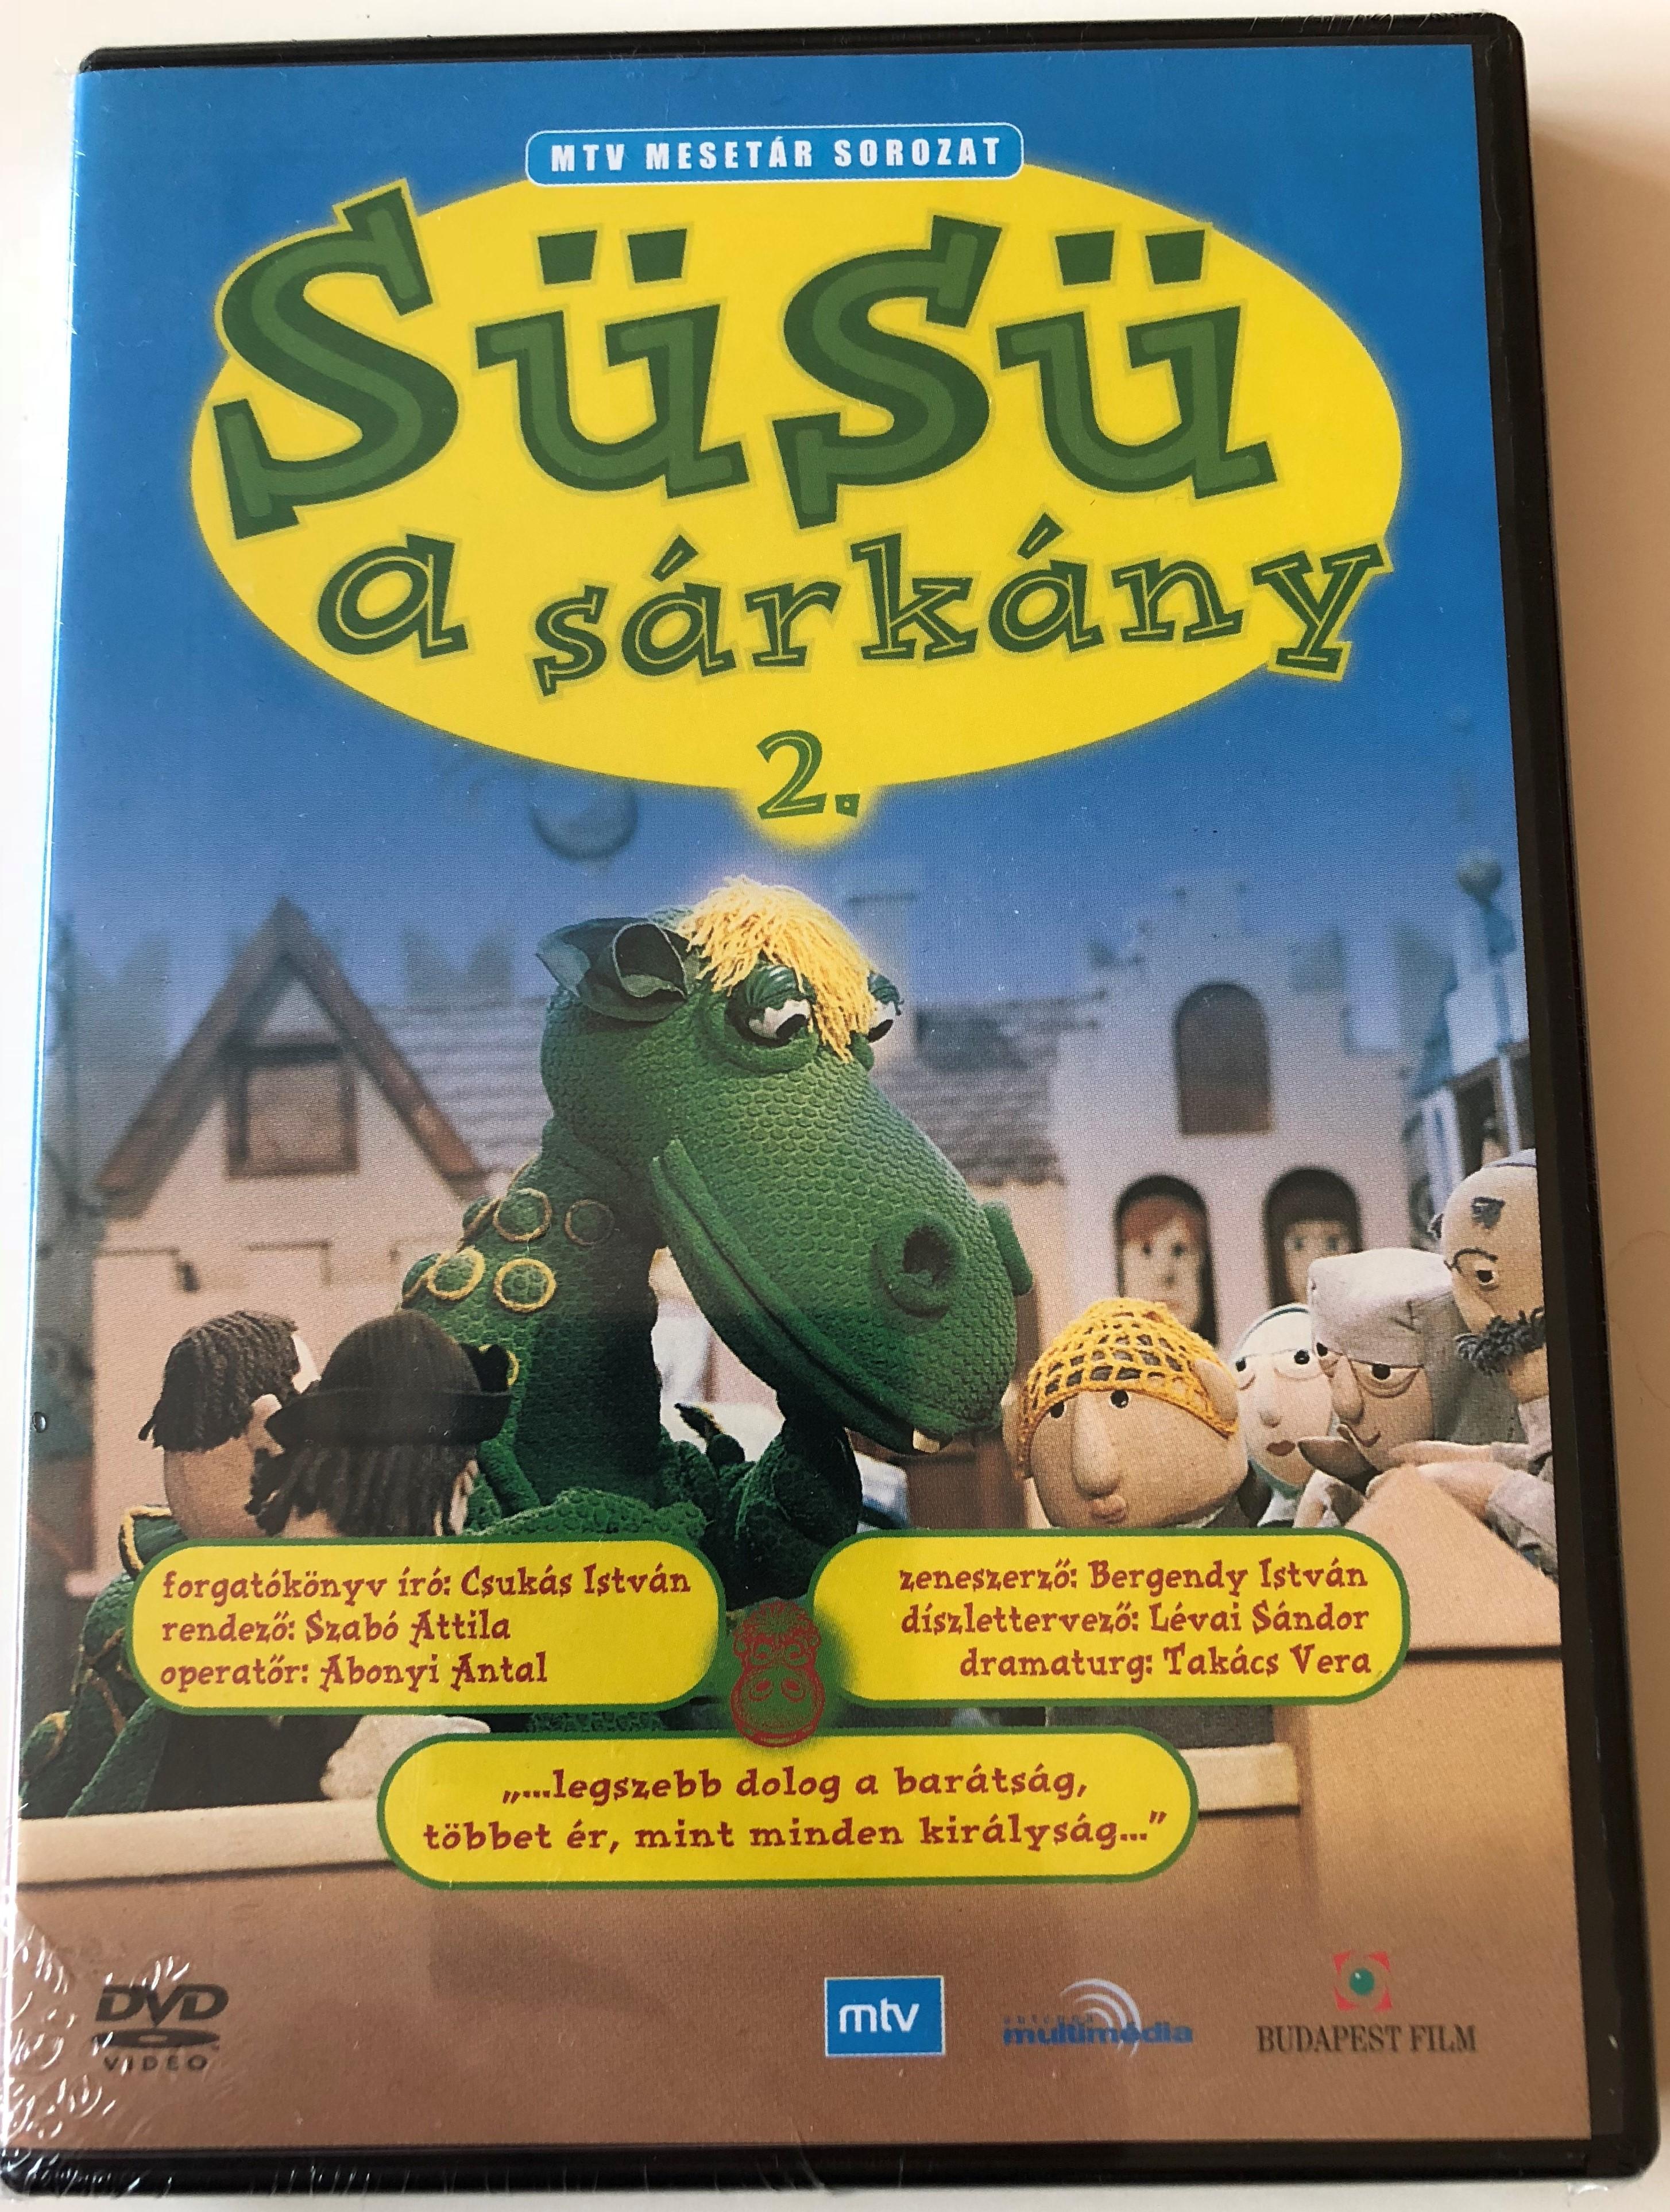 s-s-a-s-rk-ny-2.-dvd-1972-susu-the-dragon-2-directed-by-szab-attila-starring-bodrogi-gyula-sztankay-istv-n-scenario-csuk-s-istv-n-mtv-meset-r-sorozat-1-.jpg